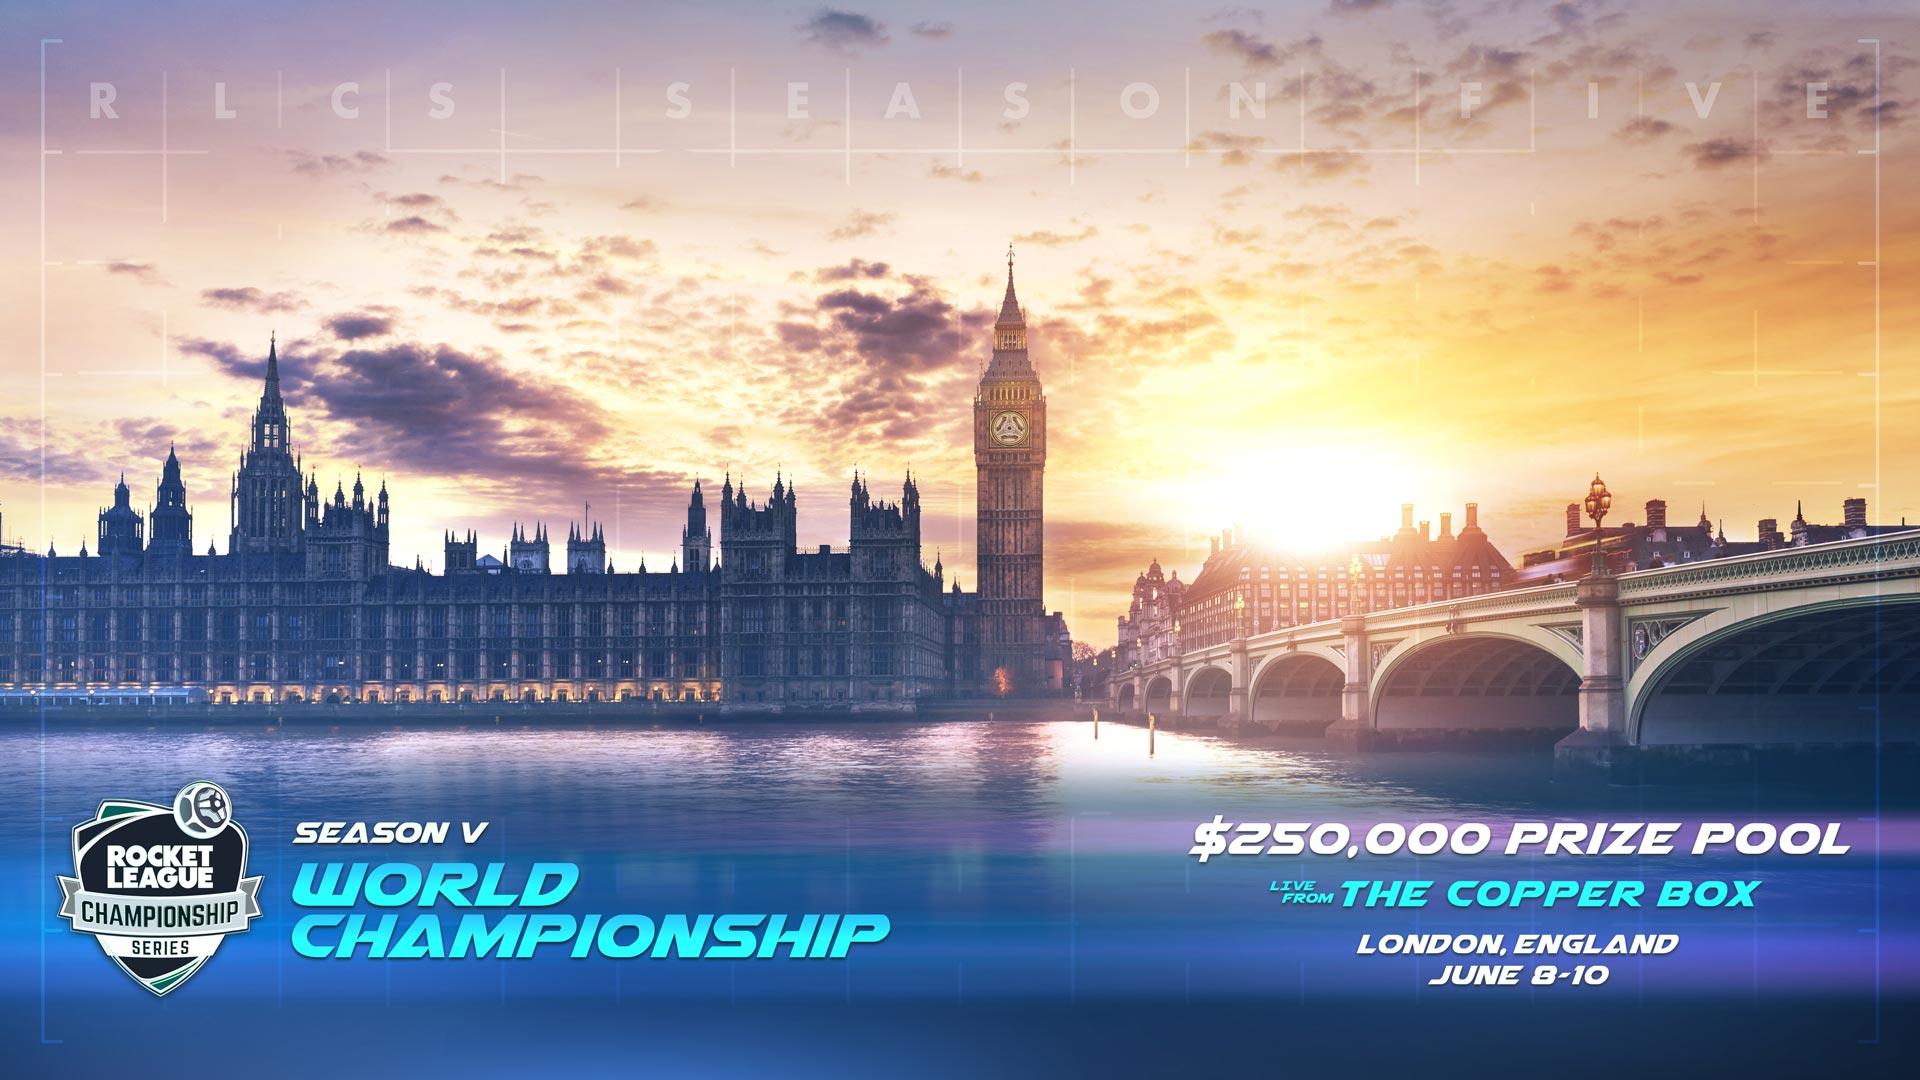 The RLCS World Championship Returns to Europe! | Rocket